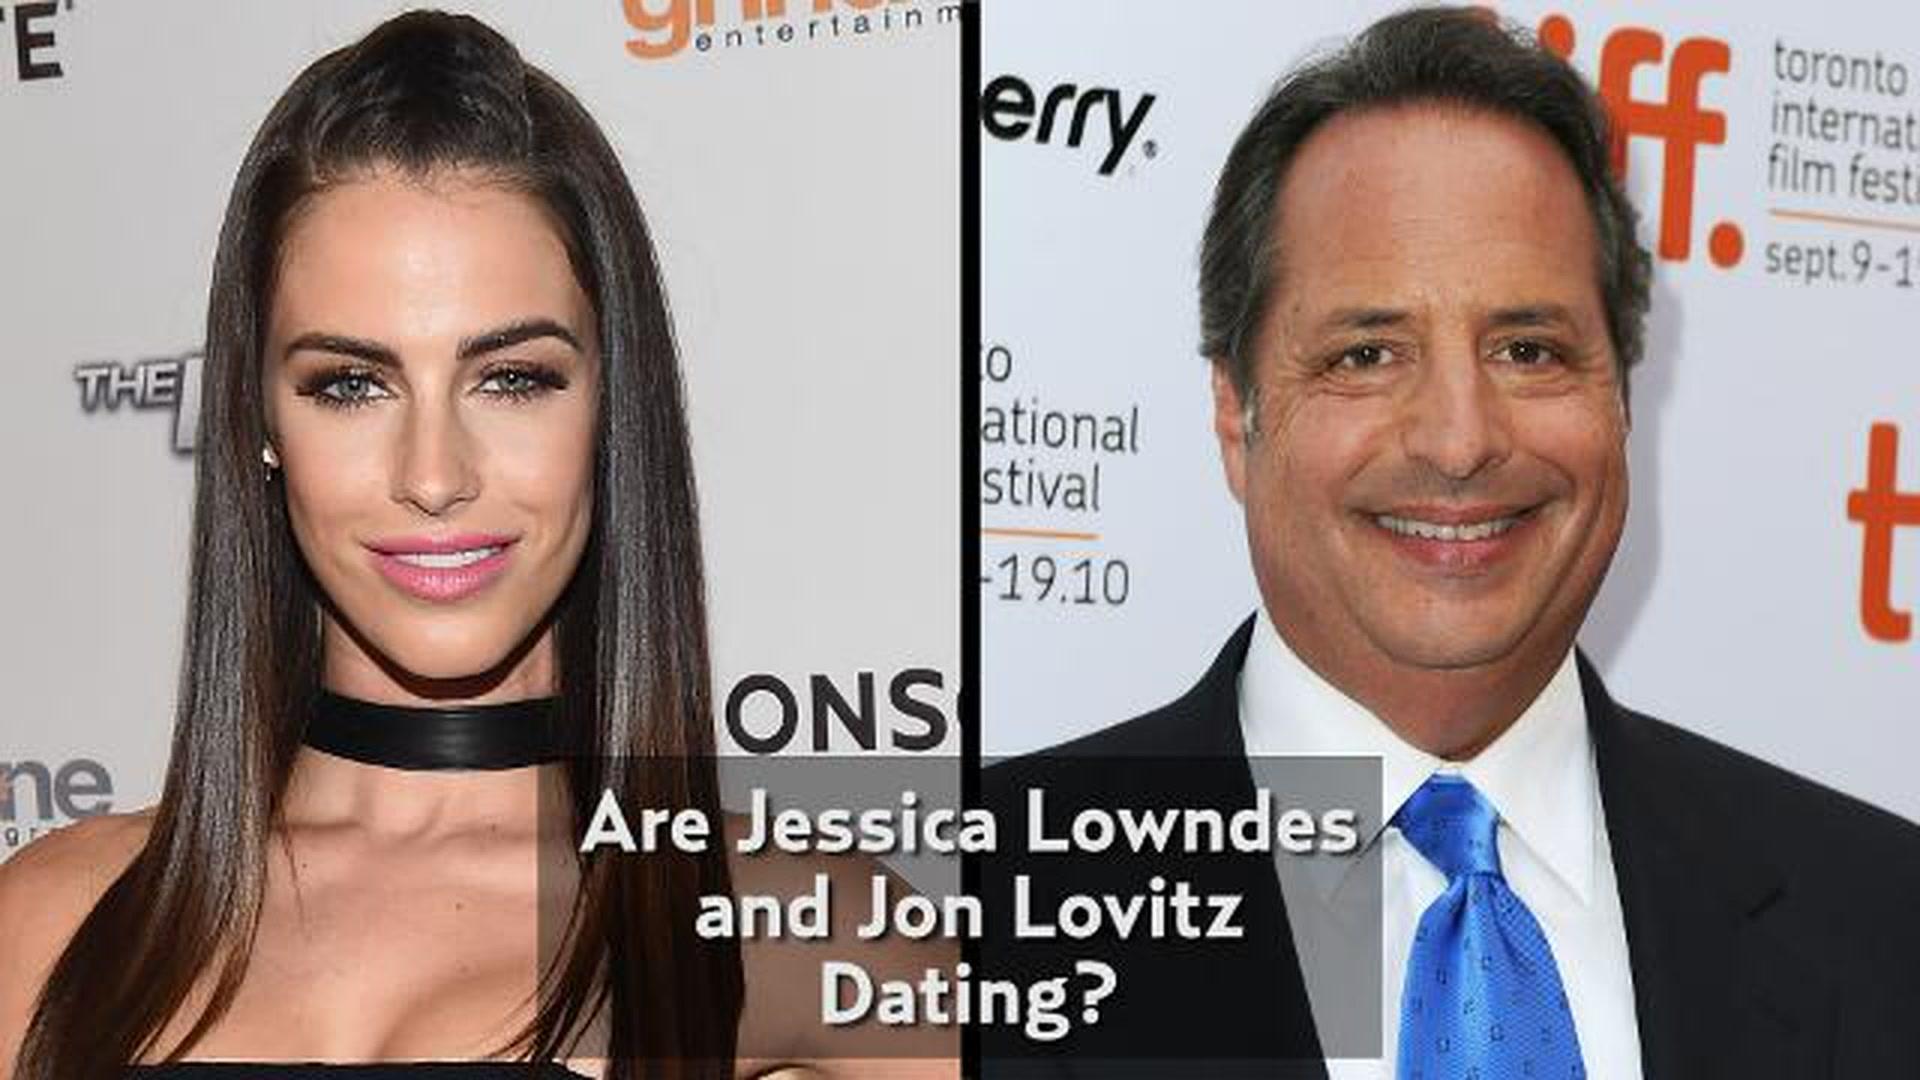 Jon Lovitz Talks Jessica Lowndes' NSFW Video: 'Younger Women Like Me!'